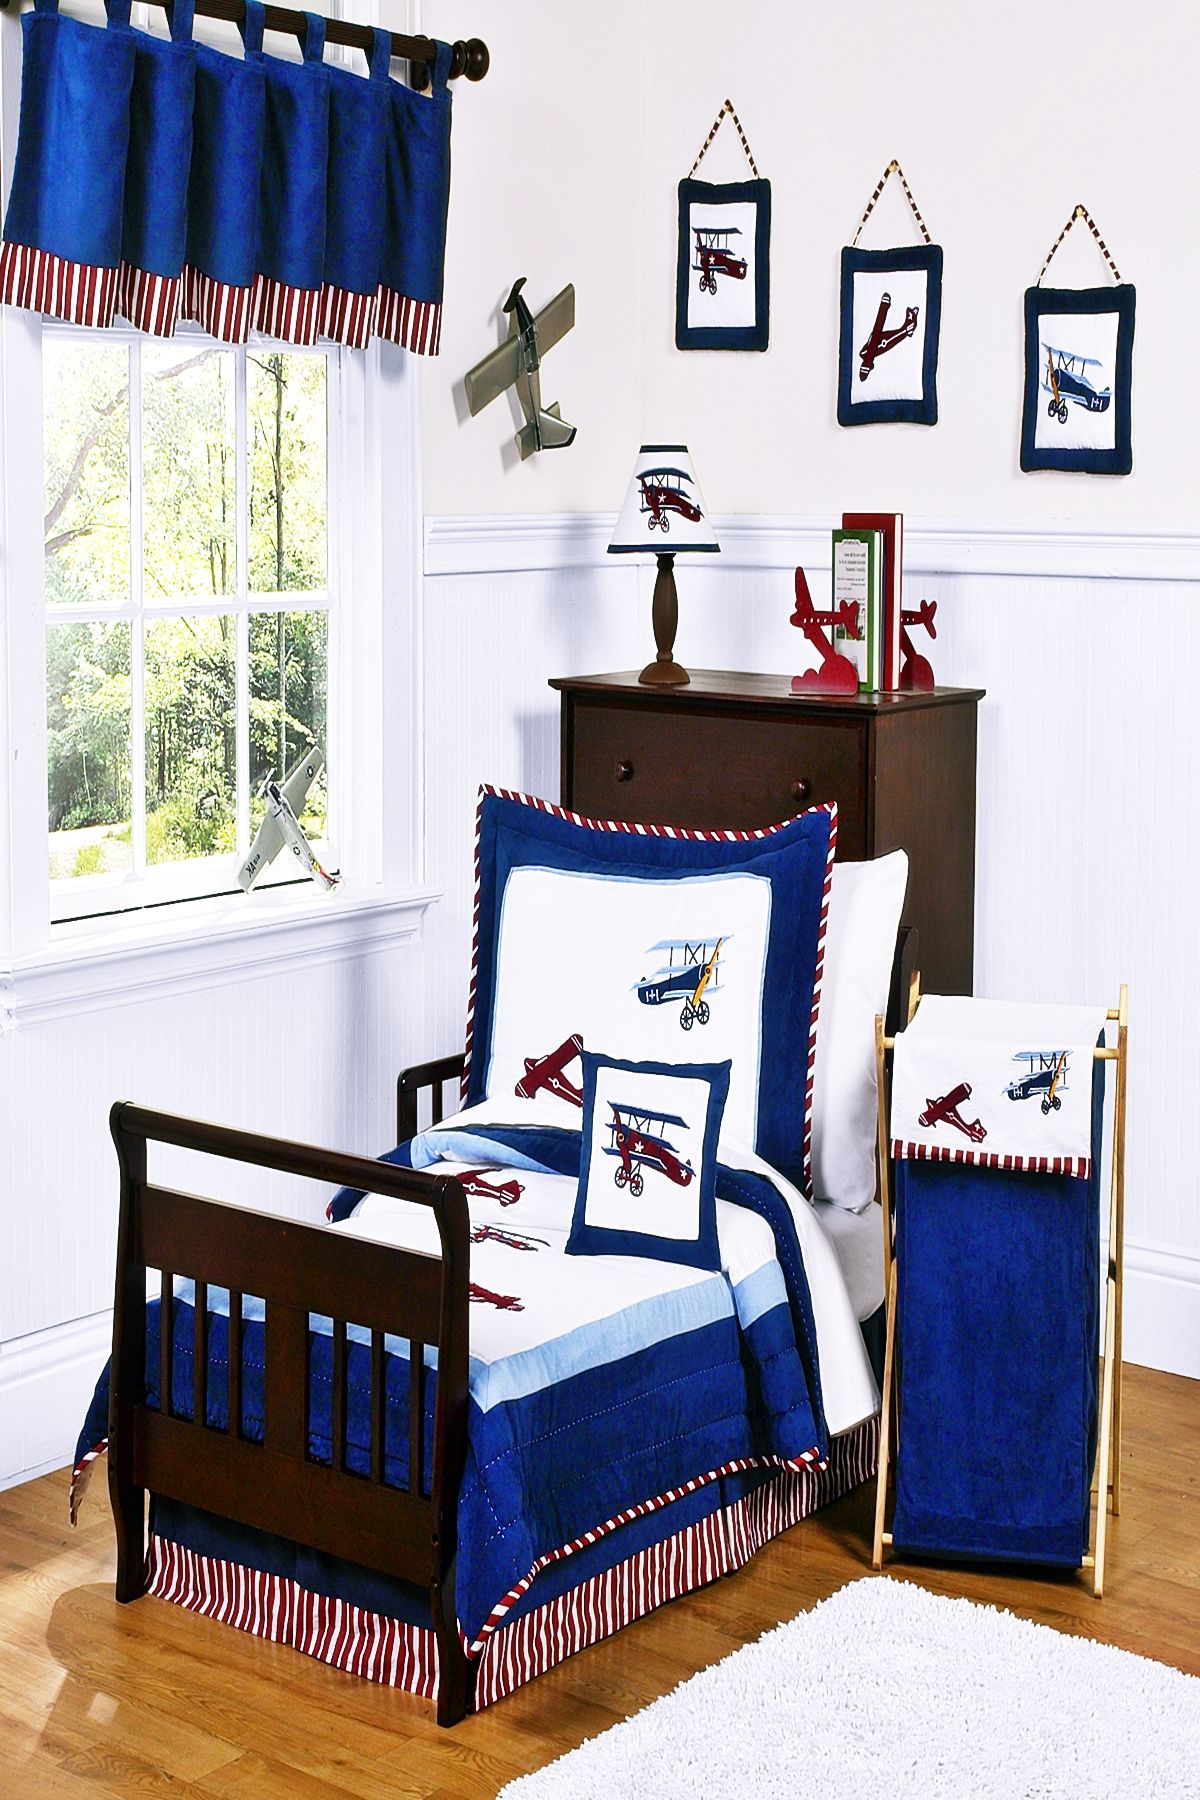 Boy Bedroom Ideas Furniture Trends 2020 | Accept vibrant ...